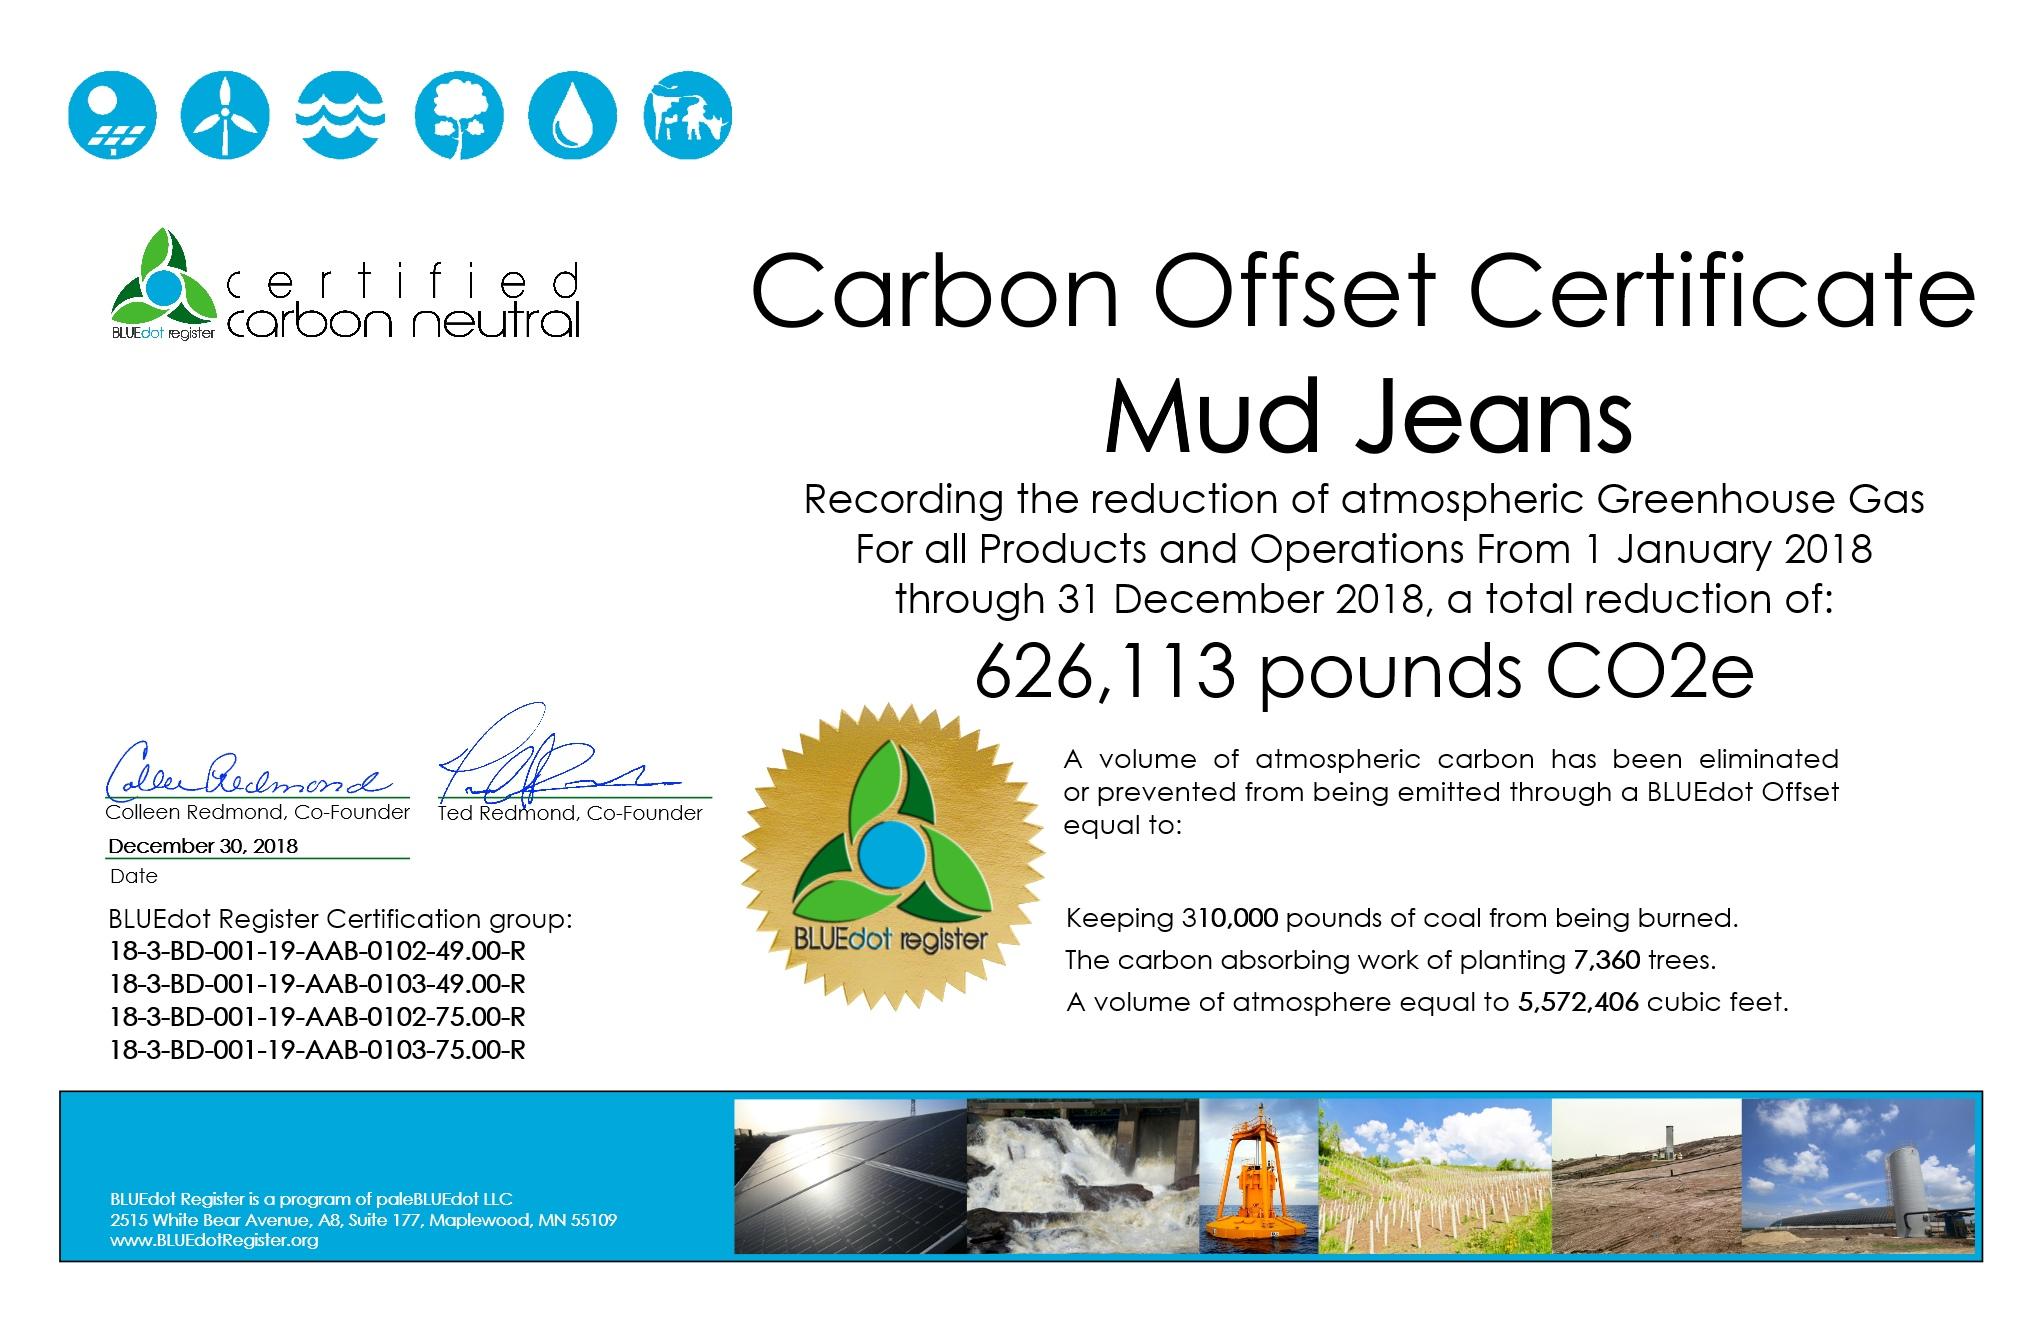 MUD Jeans 2018 Certificate